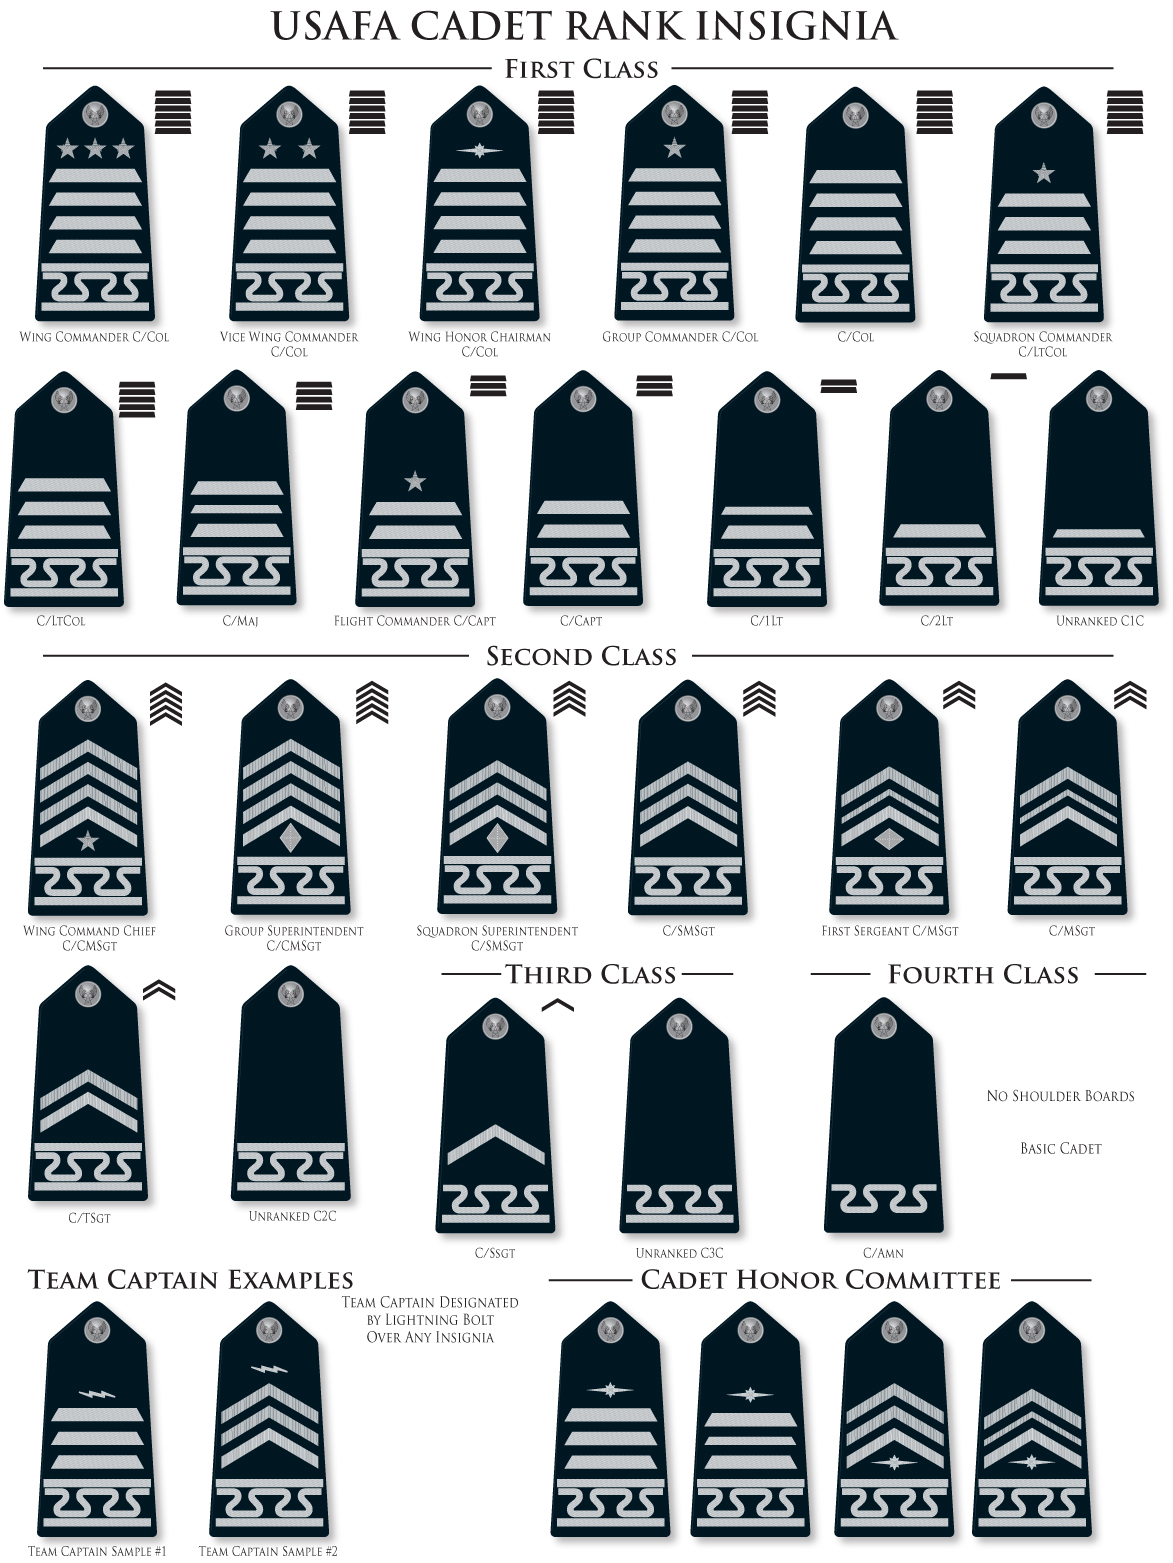 Usafa cadet rank insignia under changes to cadet uniforms metal ranks